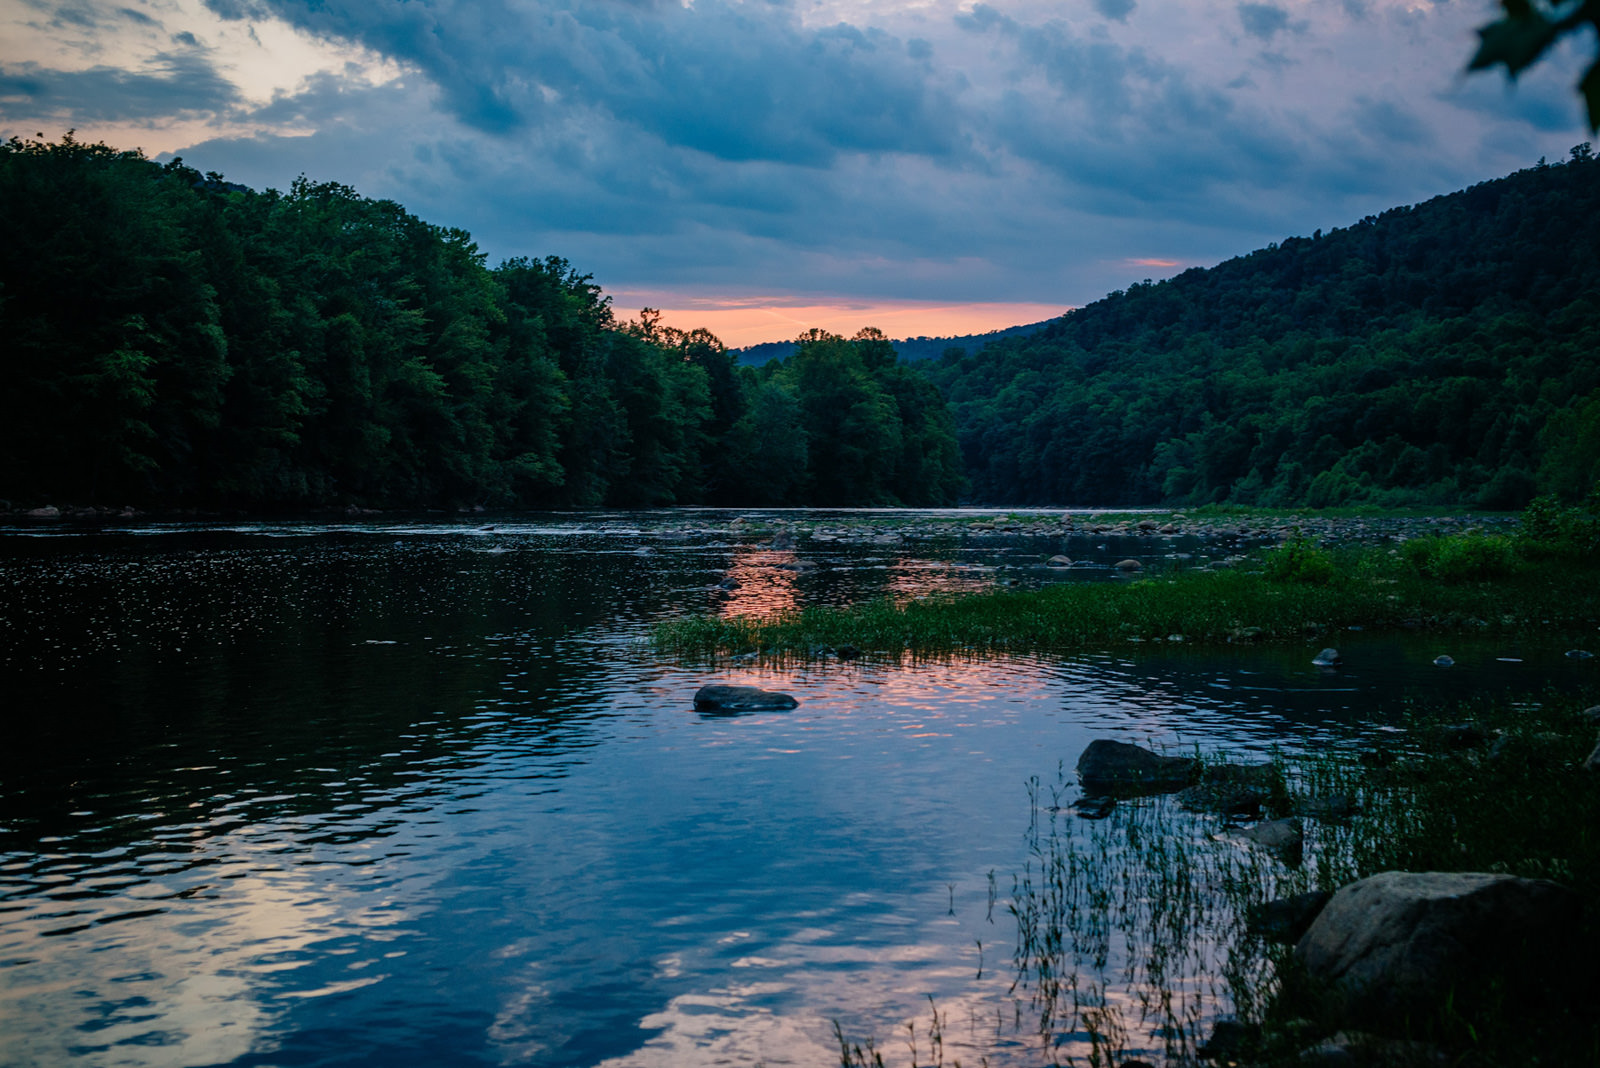 sunset cheat river west virginia